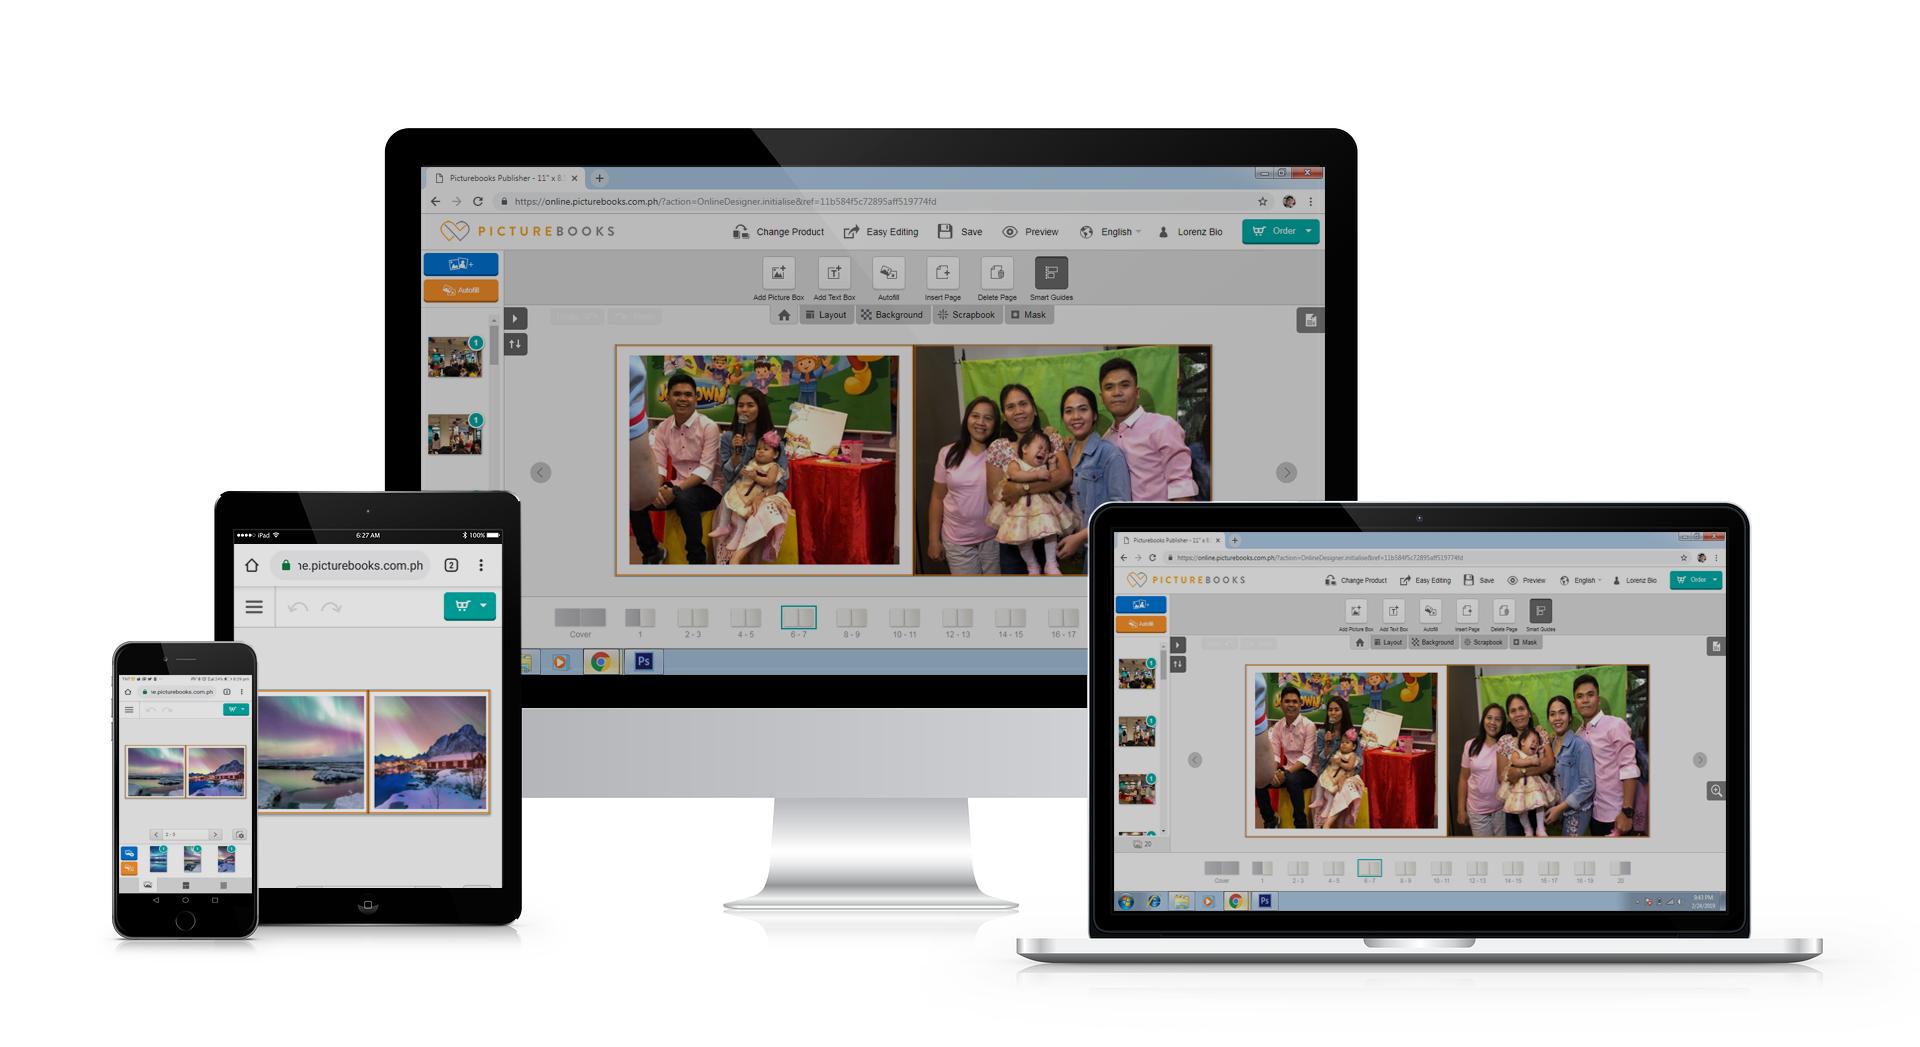 Online Publisher - PictureBooks